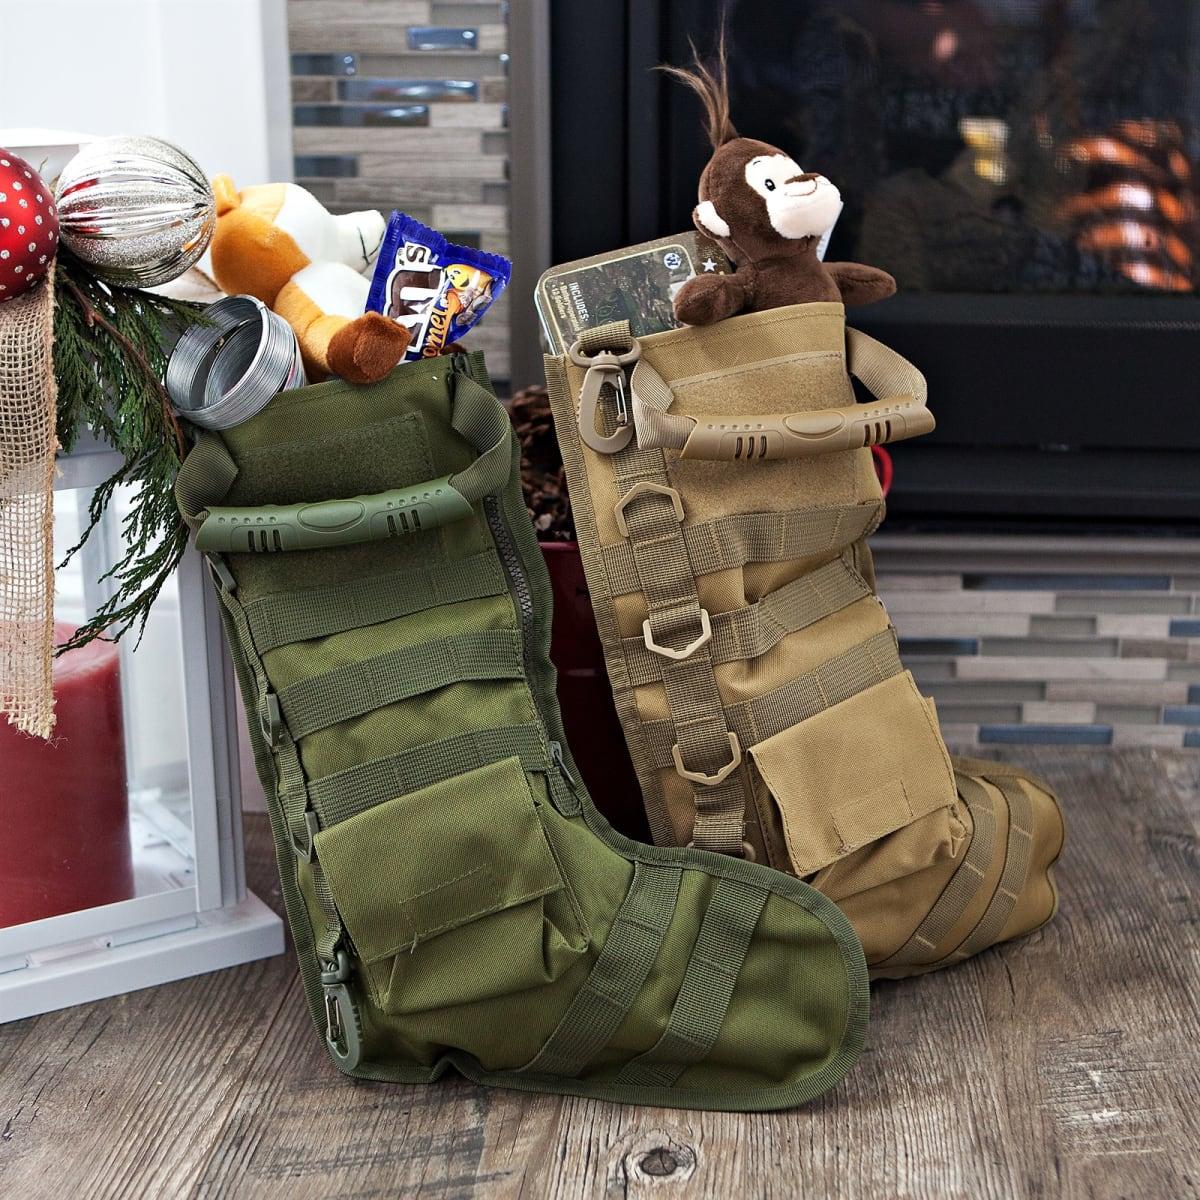 Tactical Christmas Stocking Stuffed.Tactical Christmas Stocking